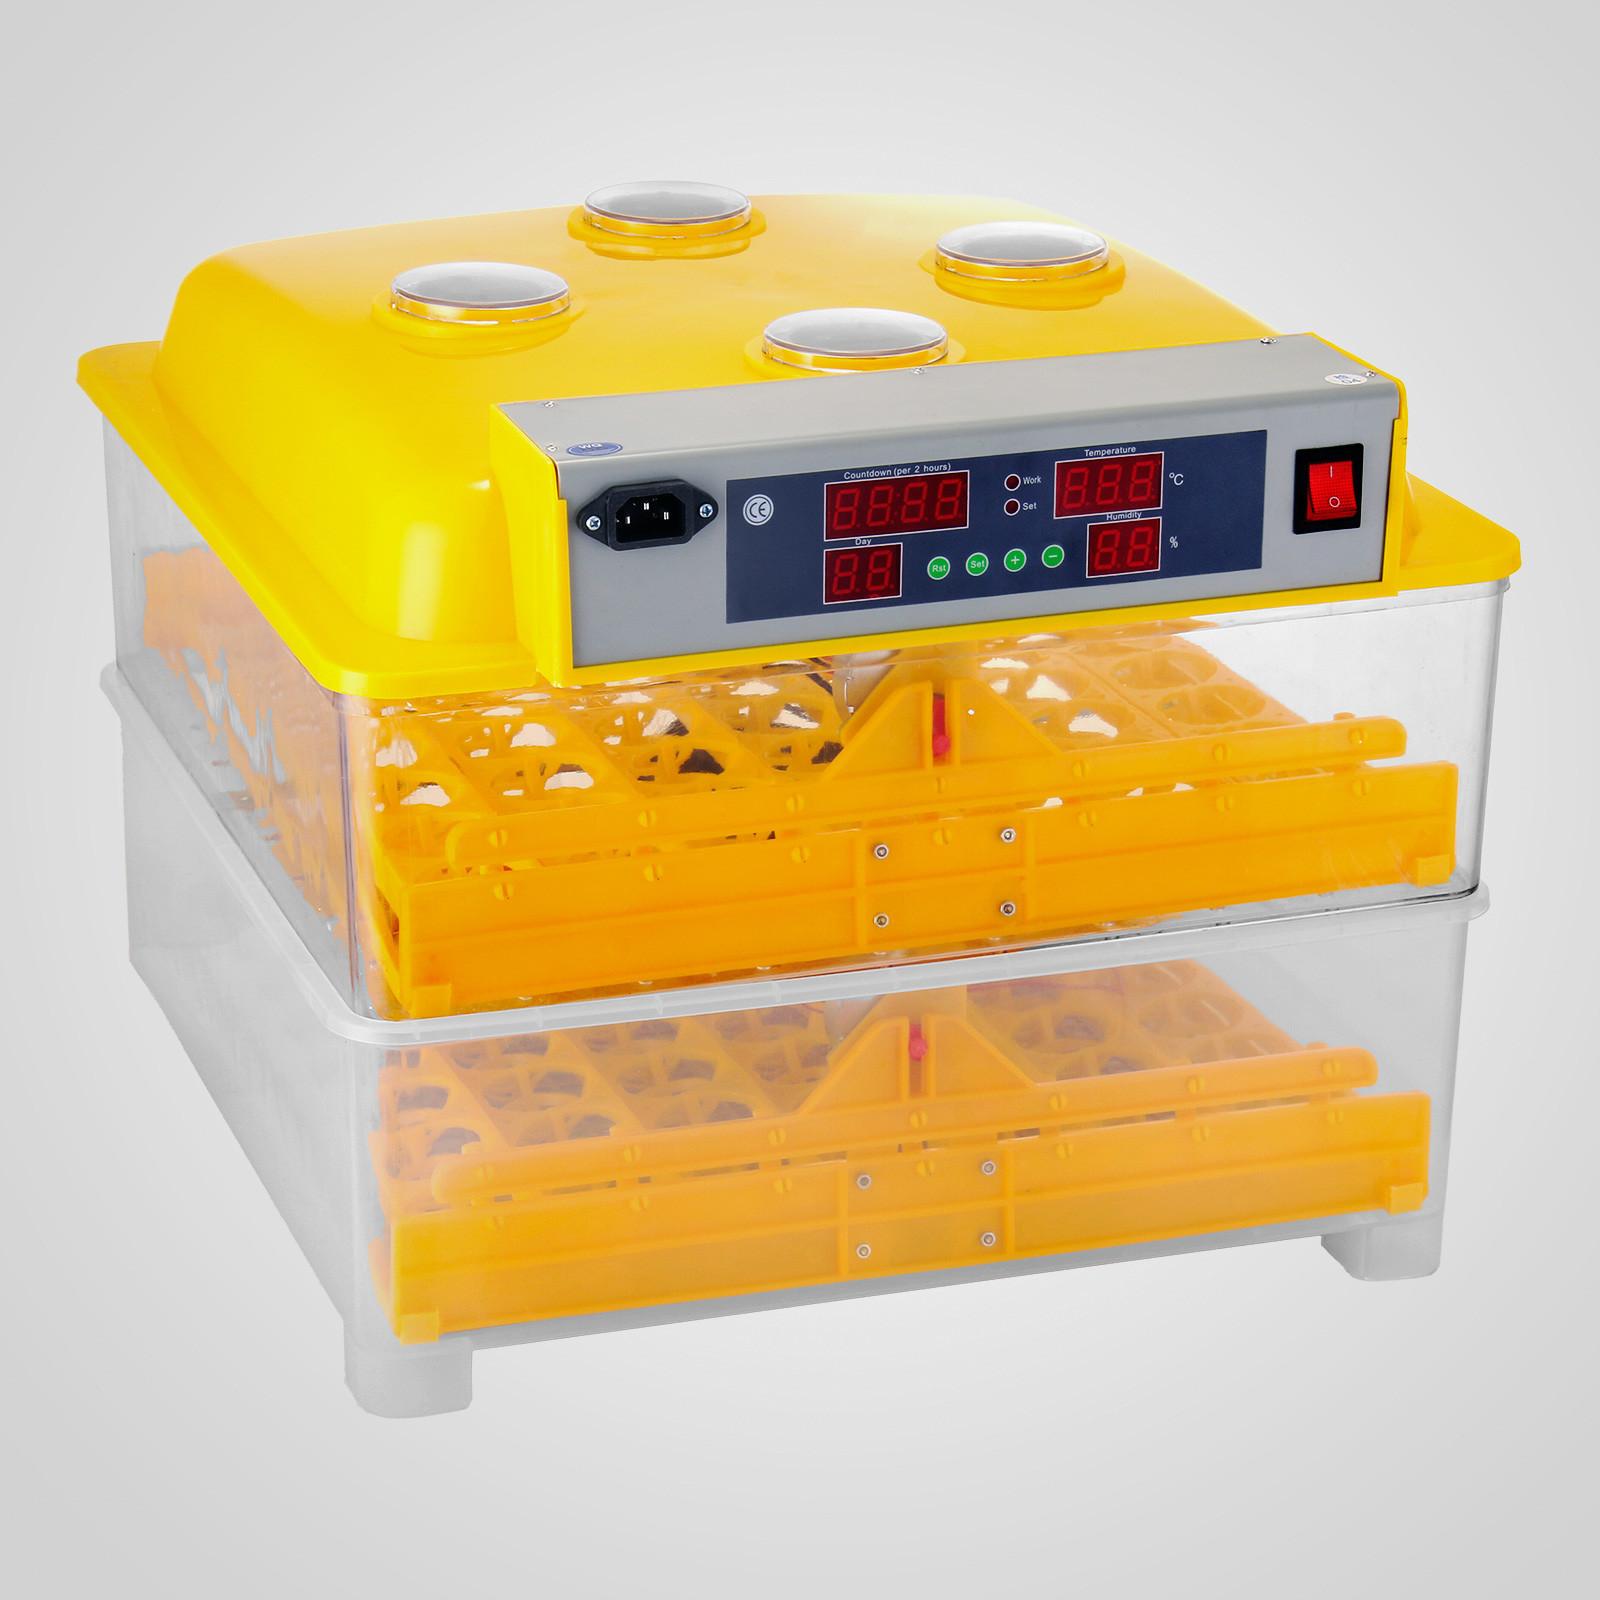 mini automatic egg turning alarm chicken egg incubator machine